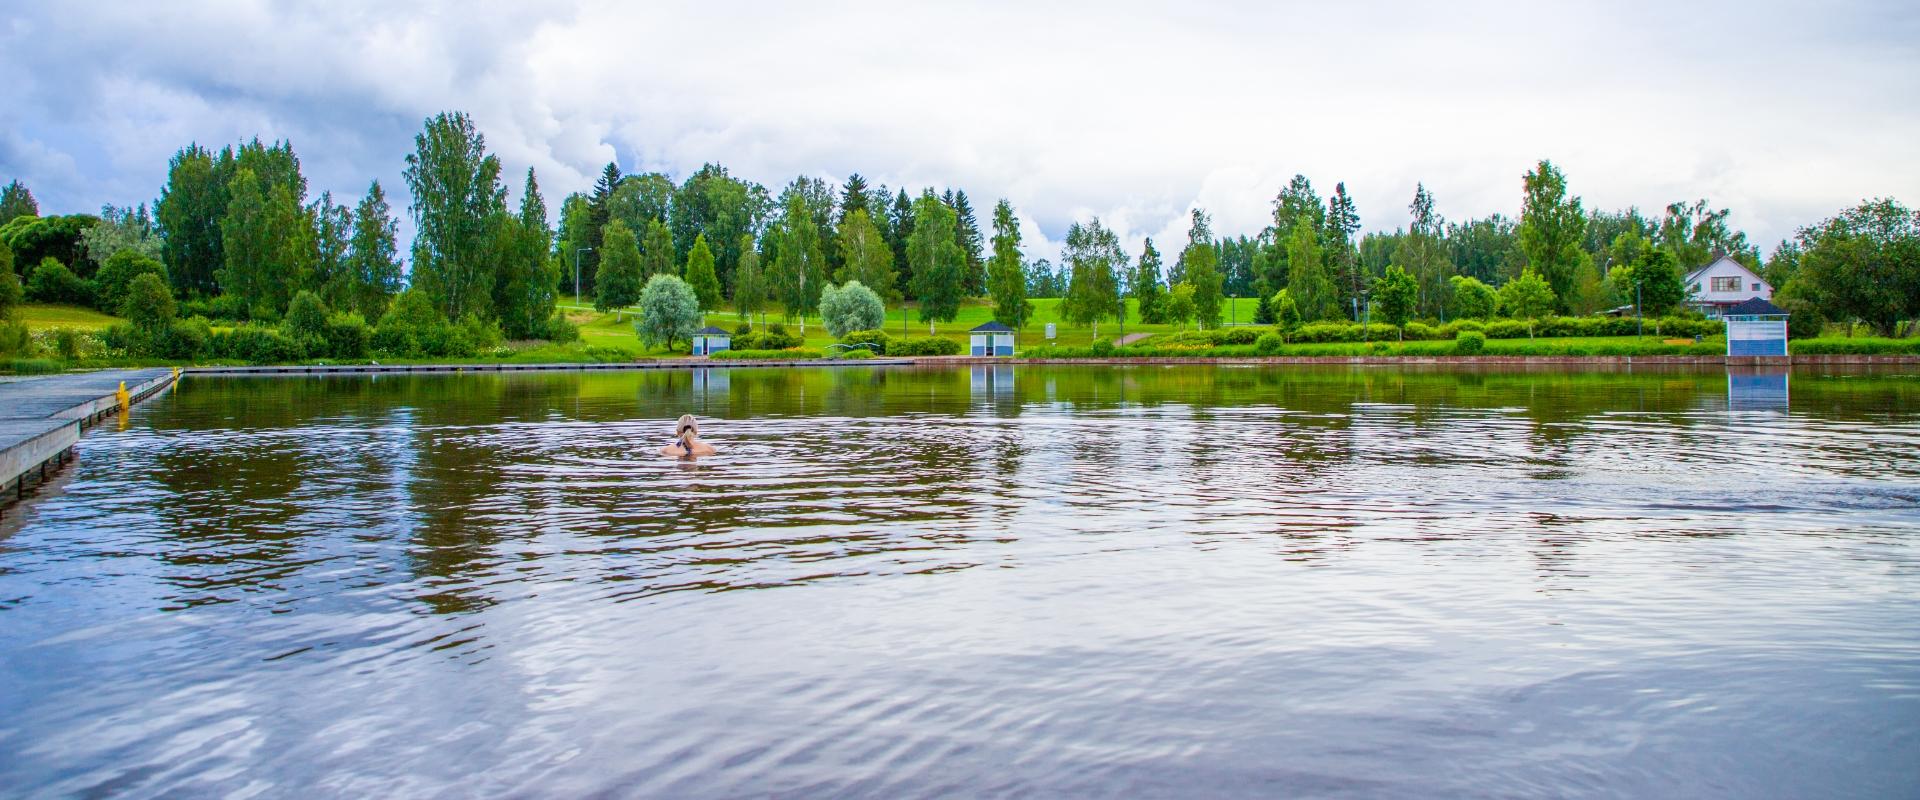 Meijerinlampi, nainen uimassa uimarannalla